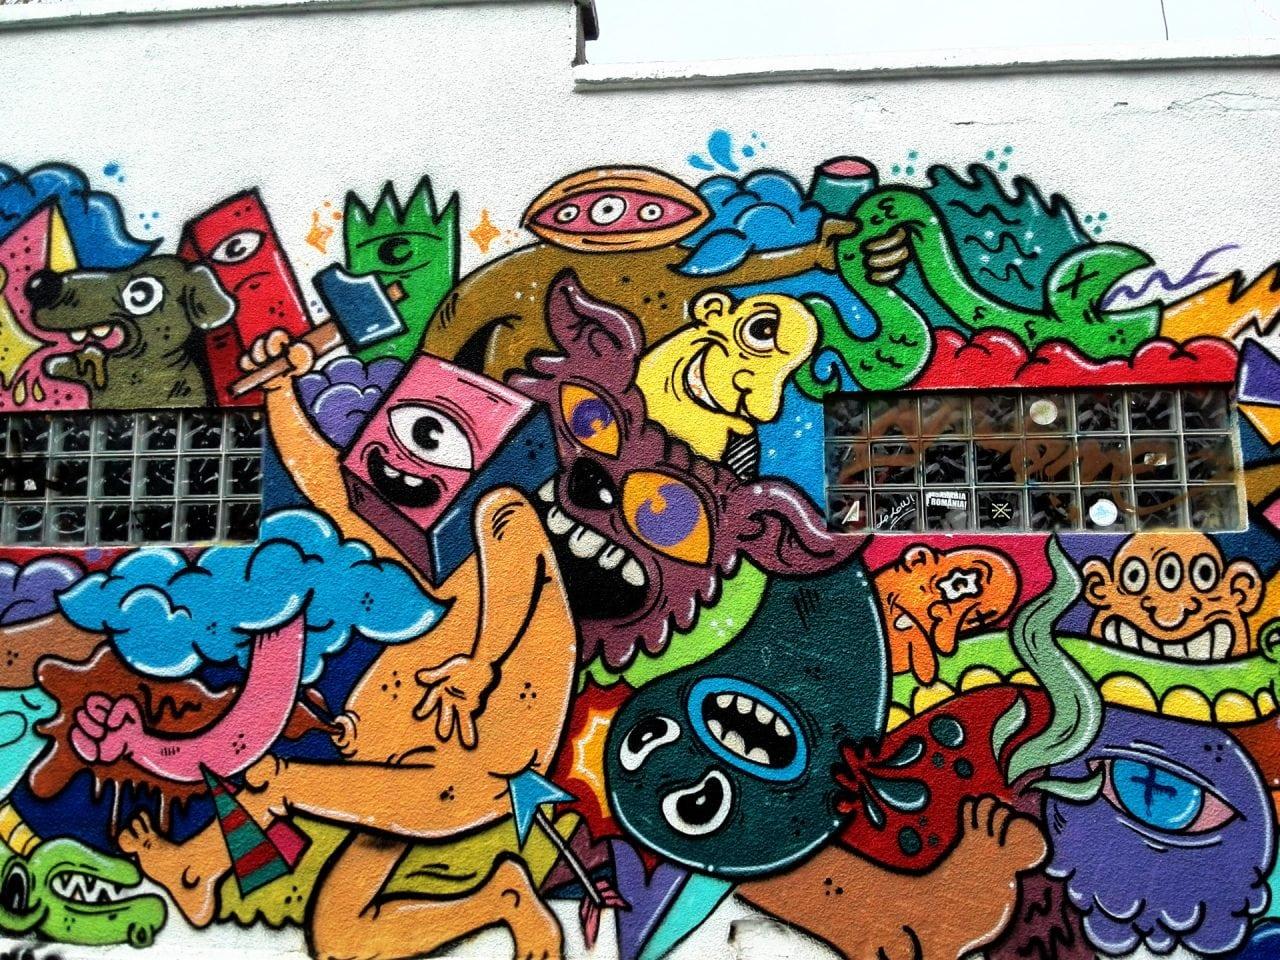 IMG 20140216 155211 - Street Art: Noua fata a oraselor